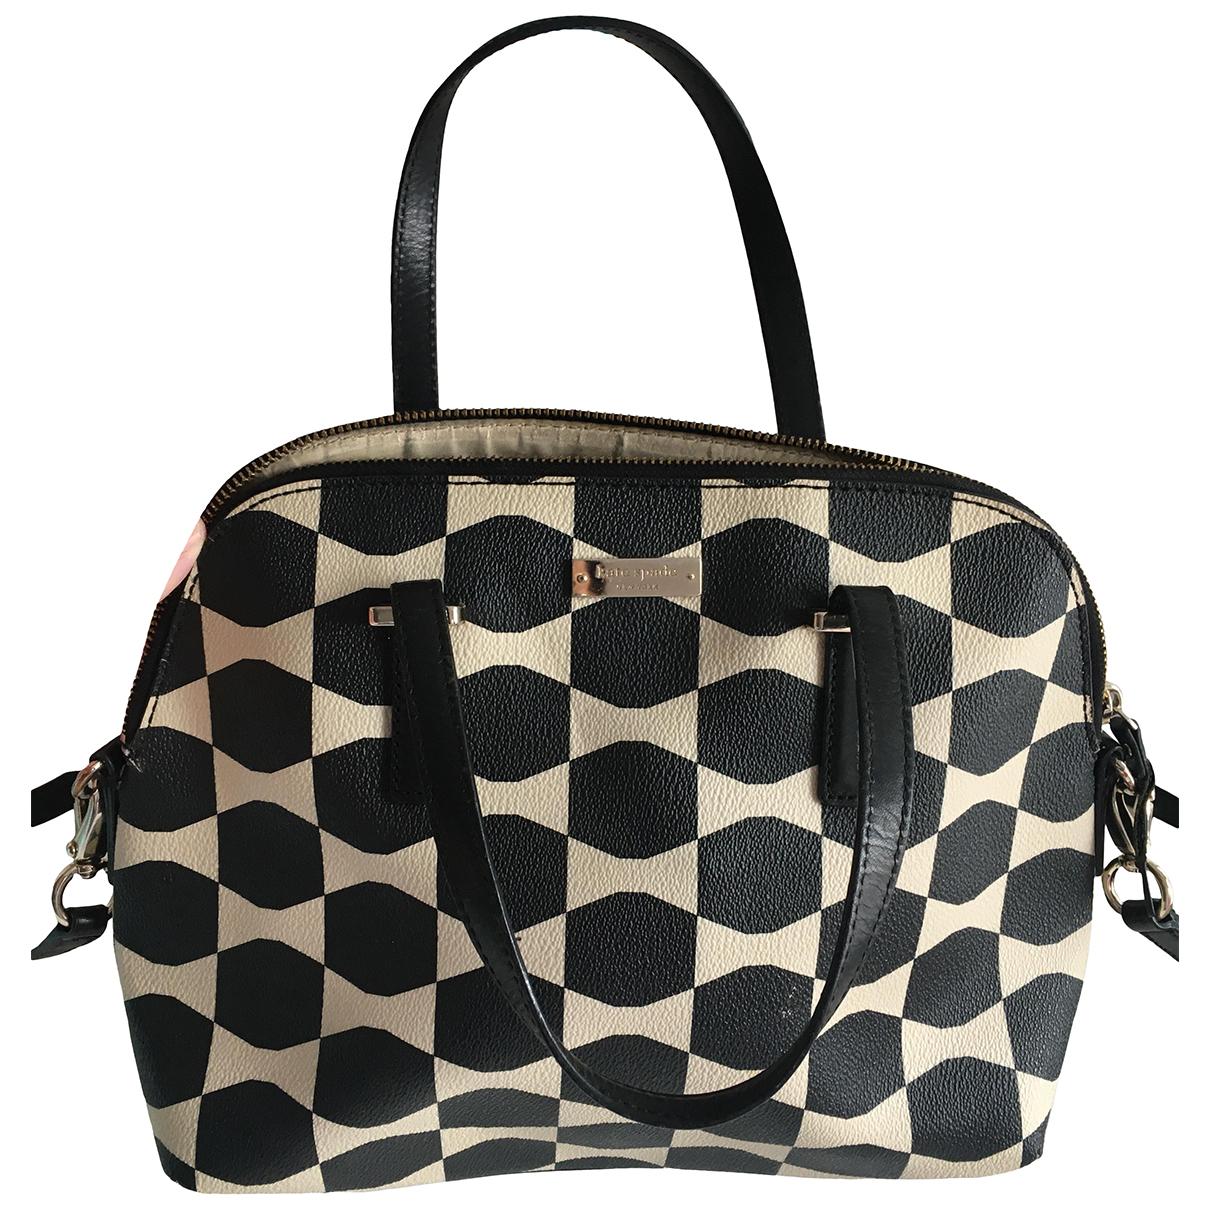 Kate Spade N Black Cloth handbag for Women N